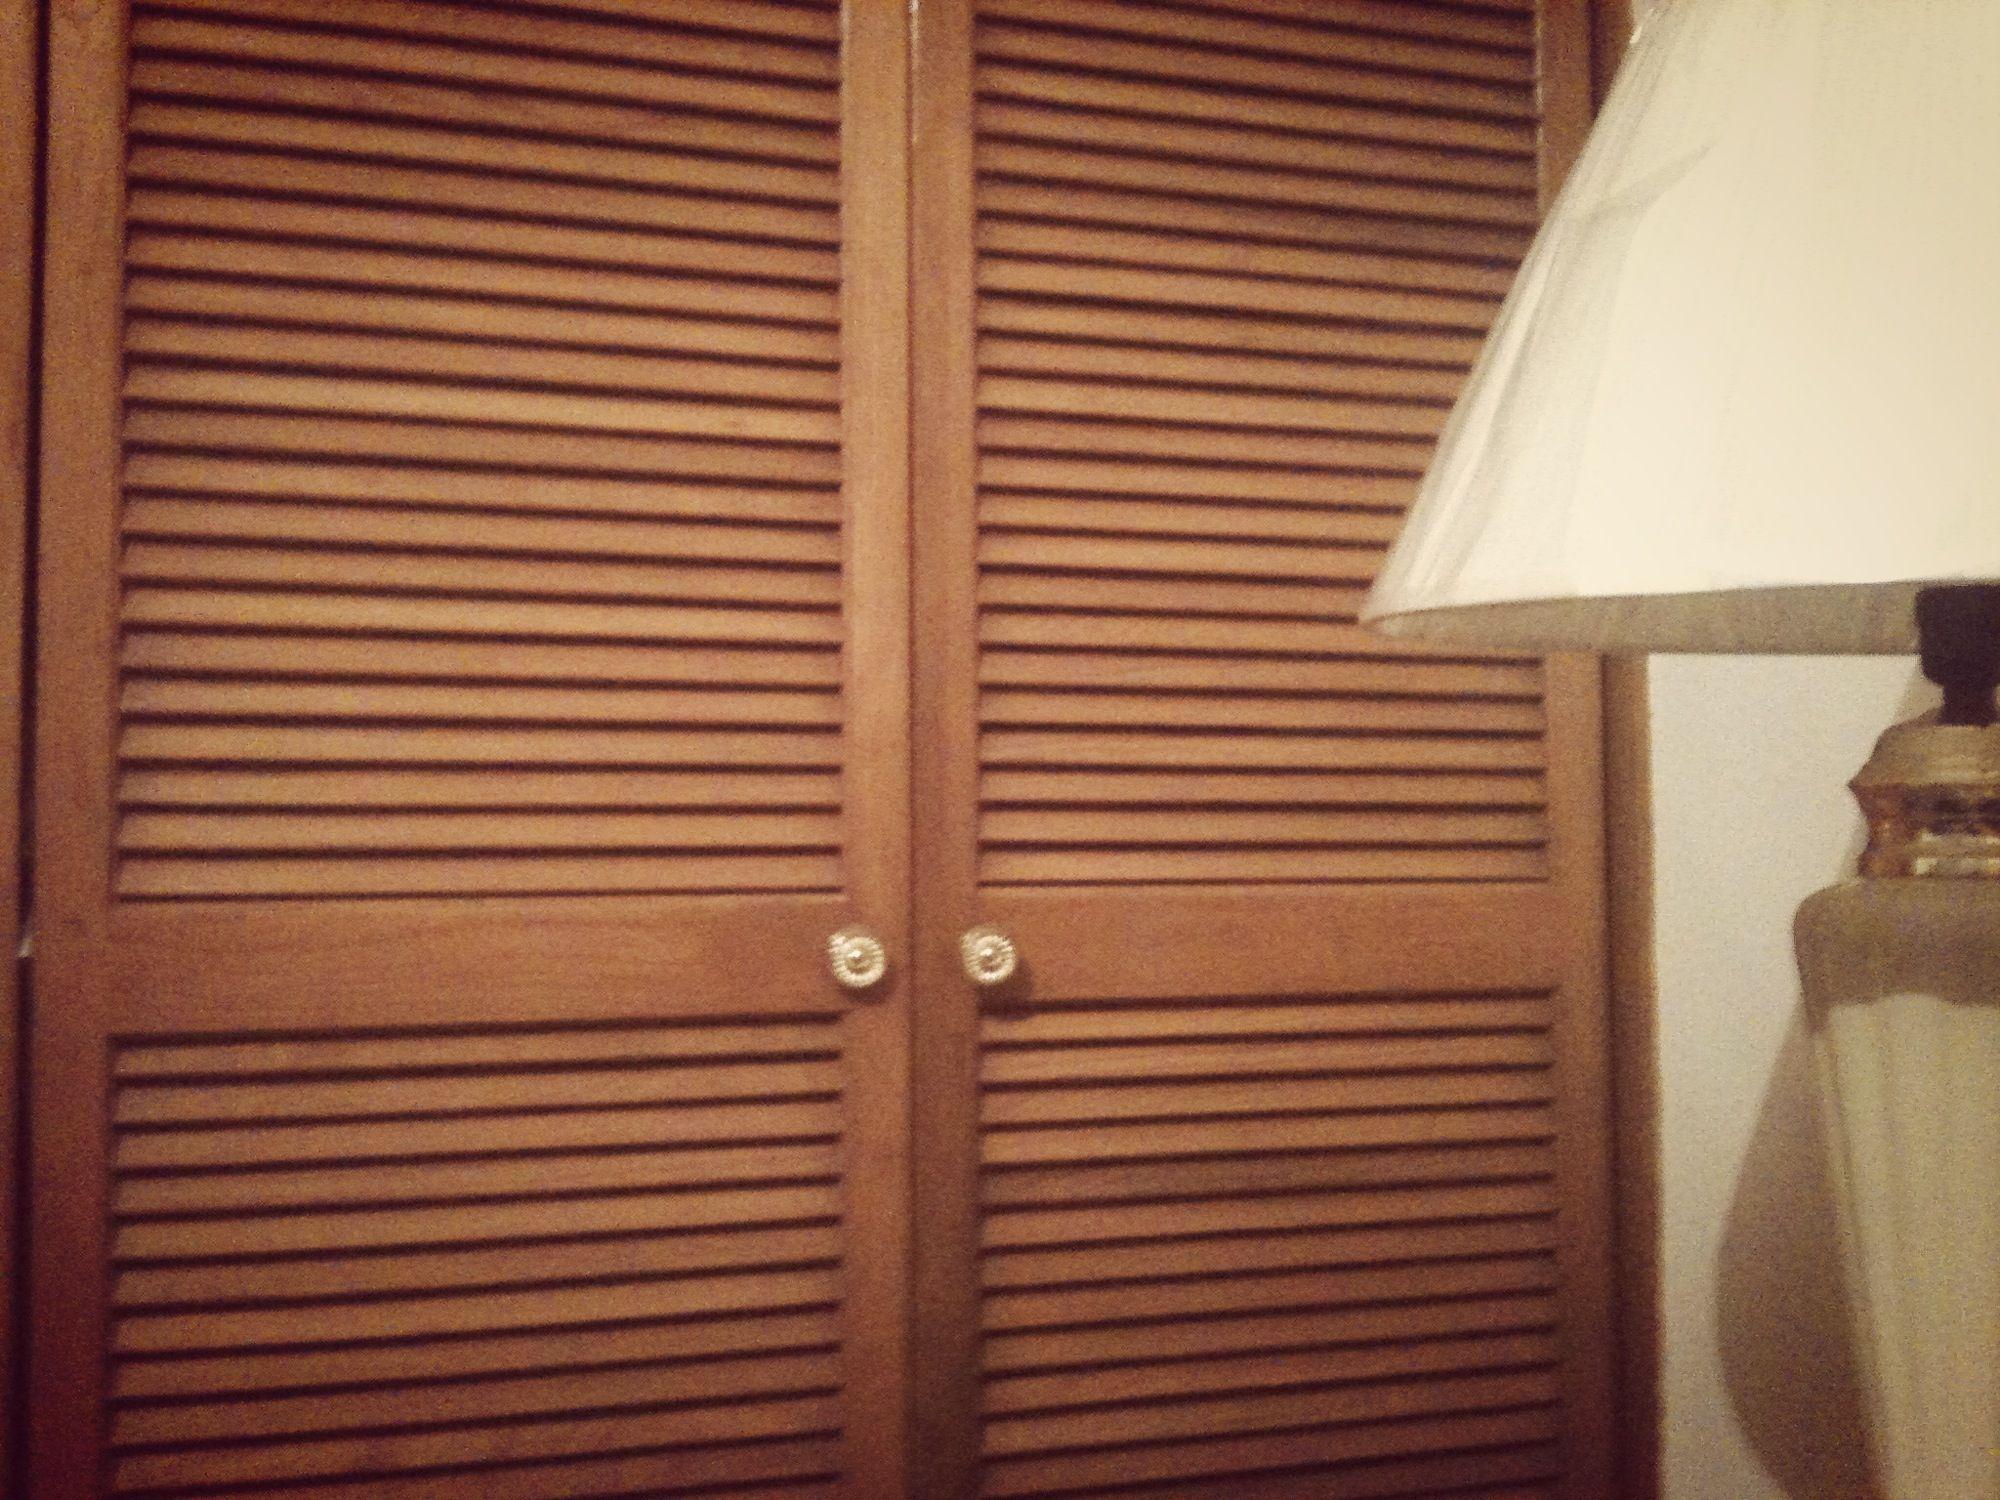 Home depot puertas para closet 28 images closets for Puerta home depot